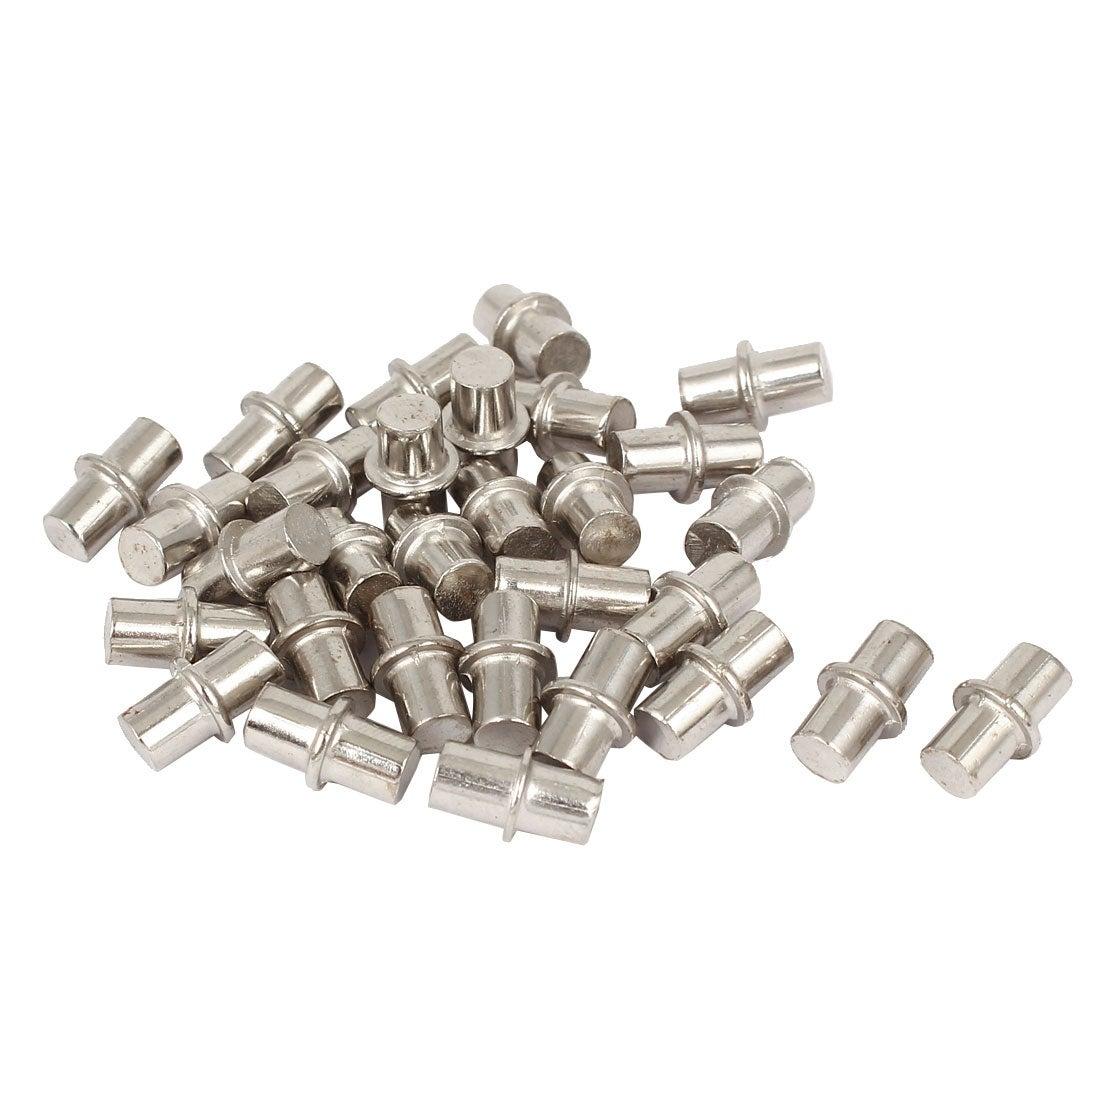 Cabinet Cupboard Wooden Board Shelf Holder Support Pins Nails 6mm x 14mm 30 Pcs